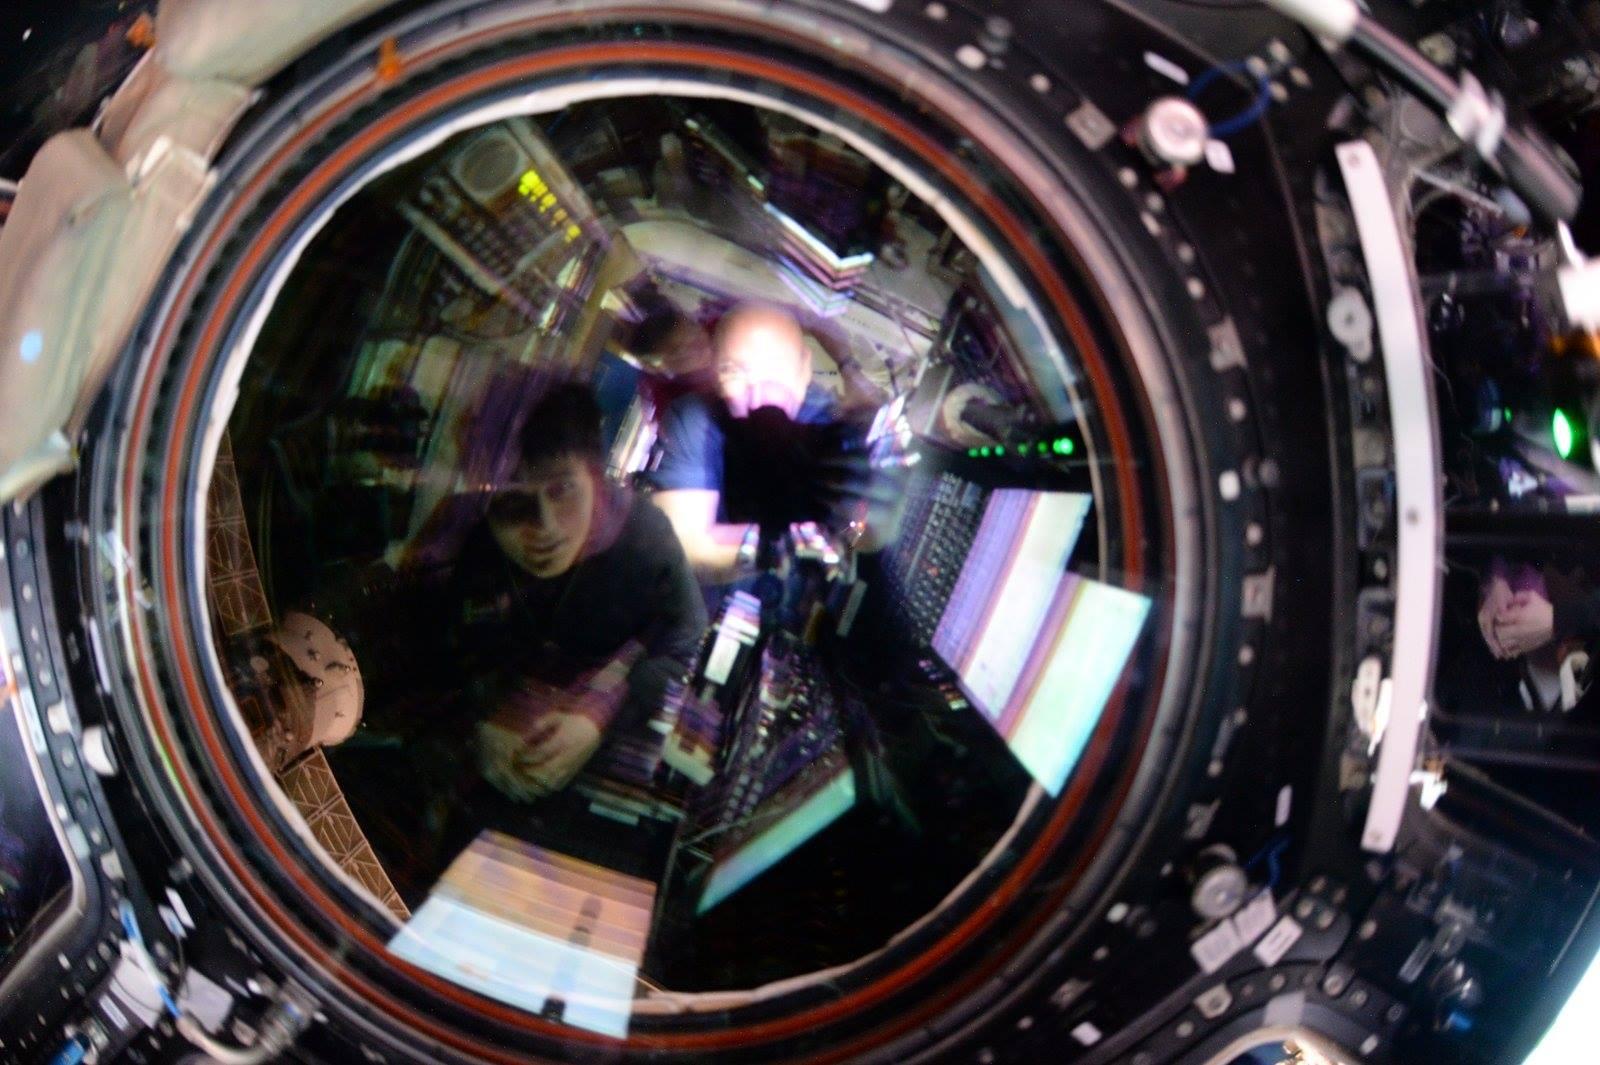 NASA Astronaut Scott Kelly And ESA Samantha Cristoforetti Reflected In Circular Lens Watching Spacecraft Arrival